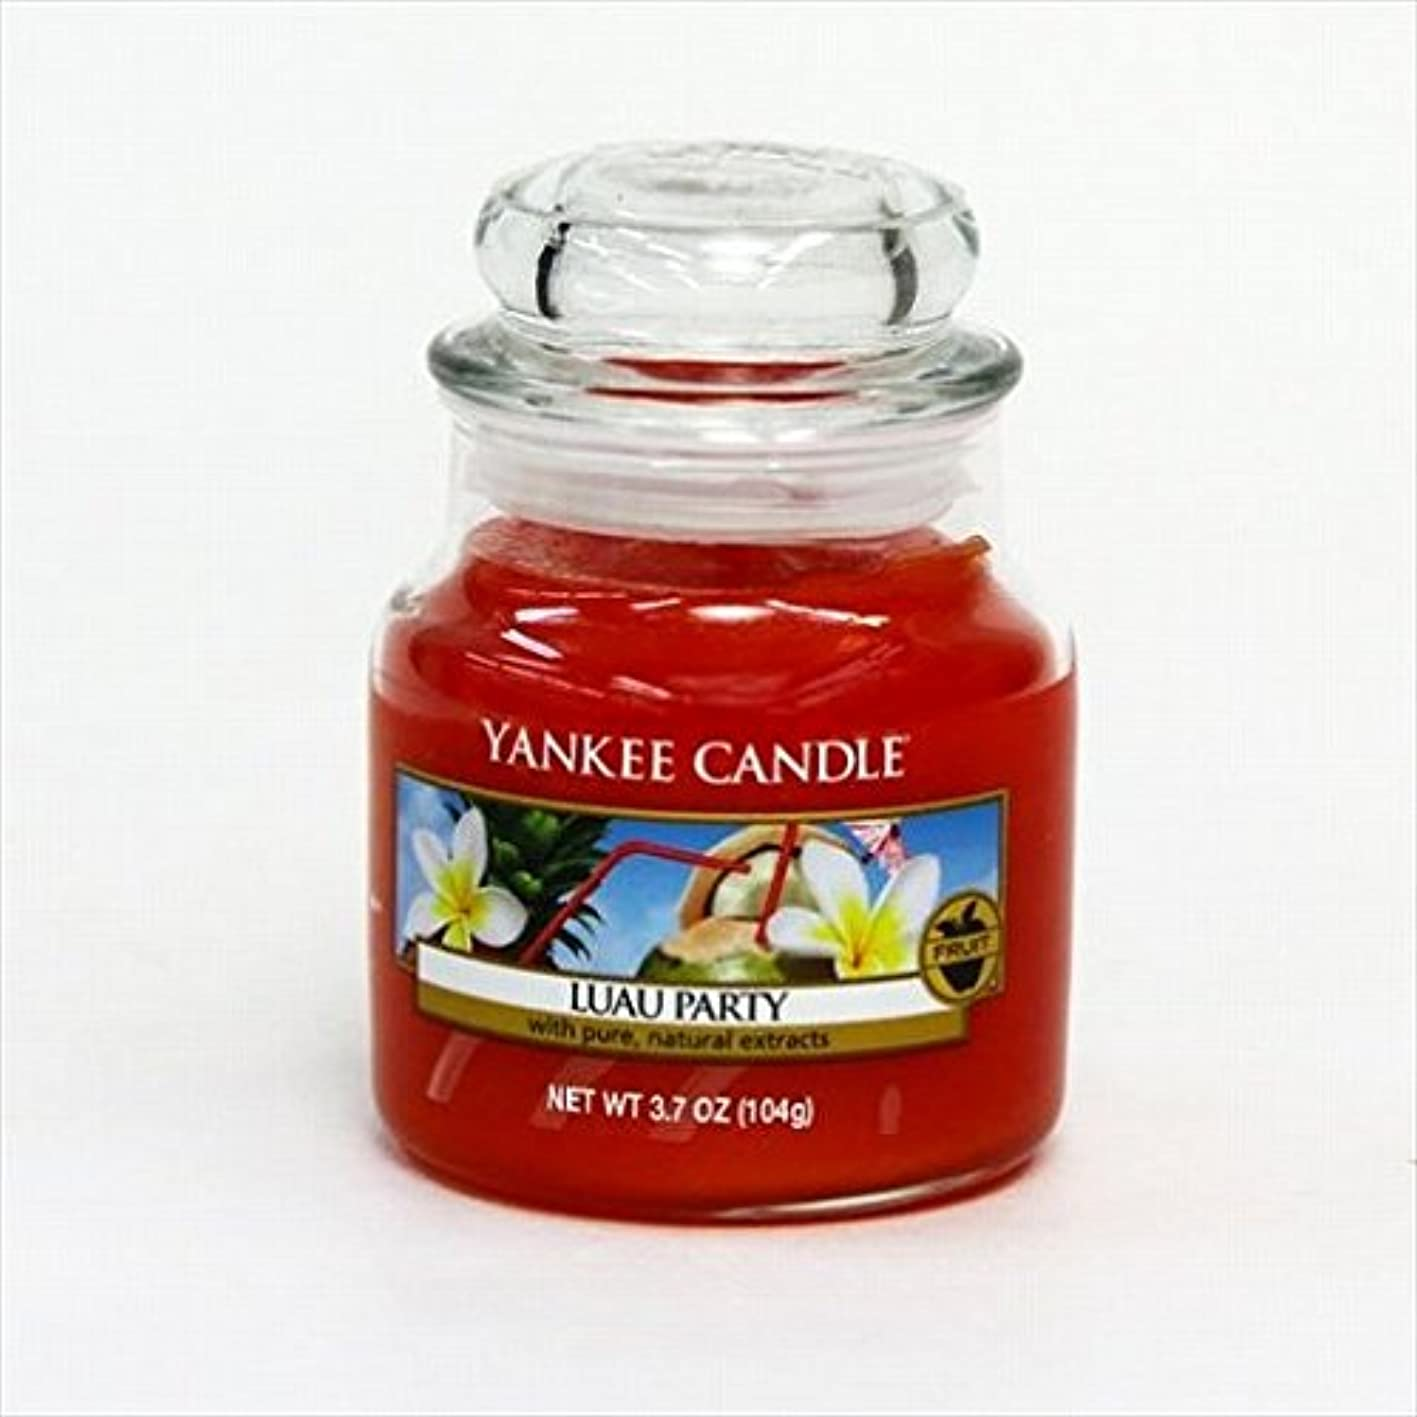 kameyama candle(カメヤマキャンドル) YANKEE CANDLE ジャーS 「 ルーアウパーティ 」 キャンドル 64x64x88mm (K00305223)